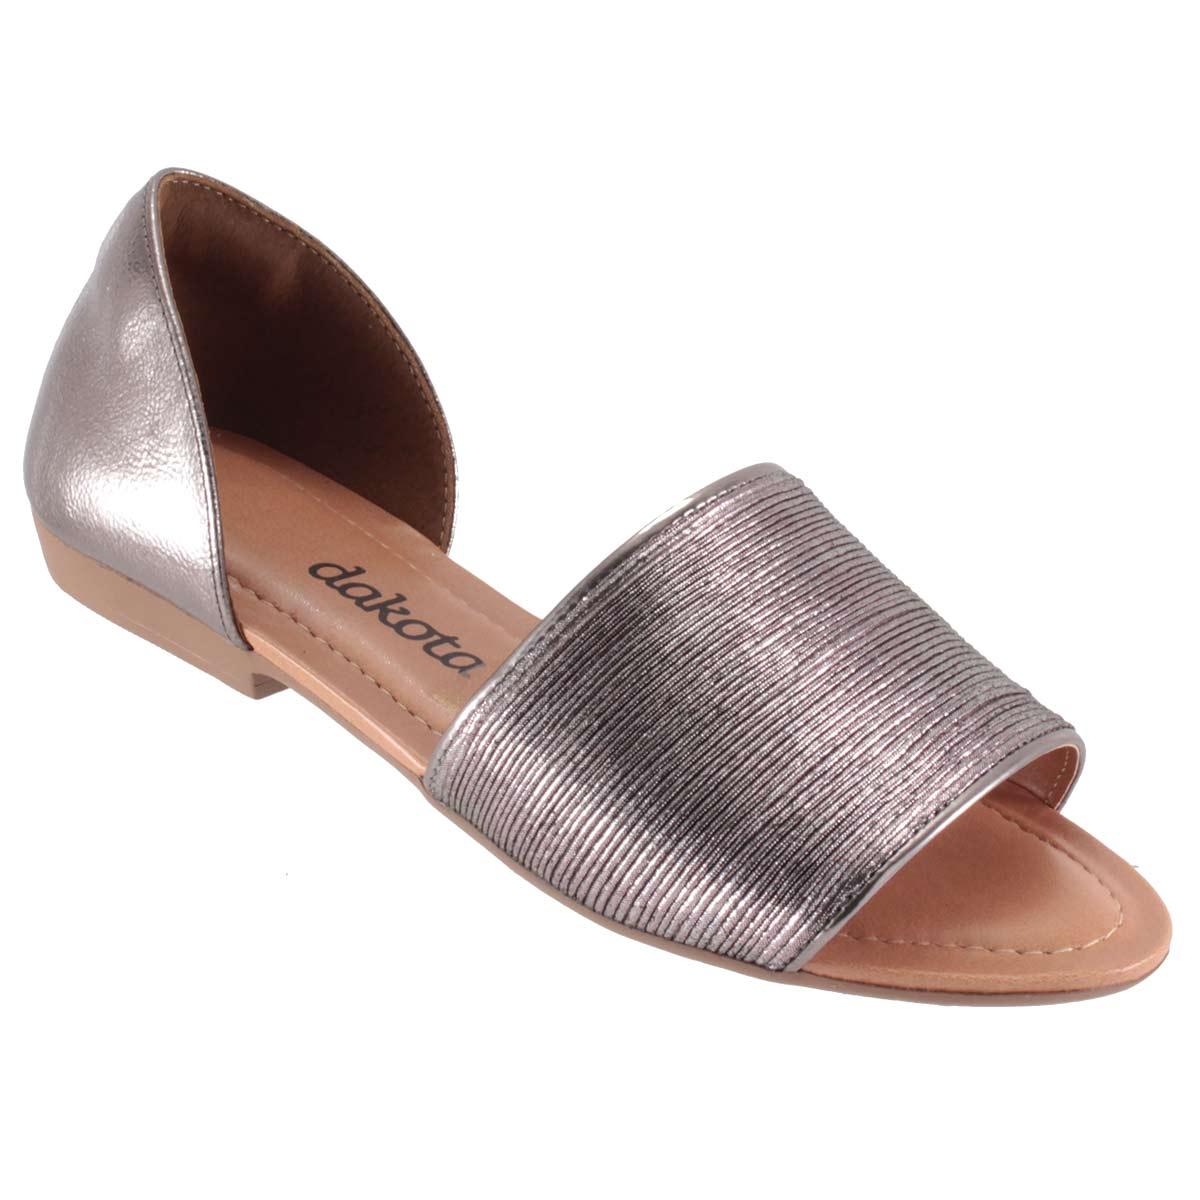 Sandália Dakota Rasteira Metalizada Feminina Linda Confortável Z2653